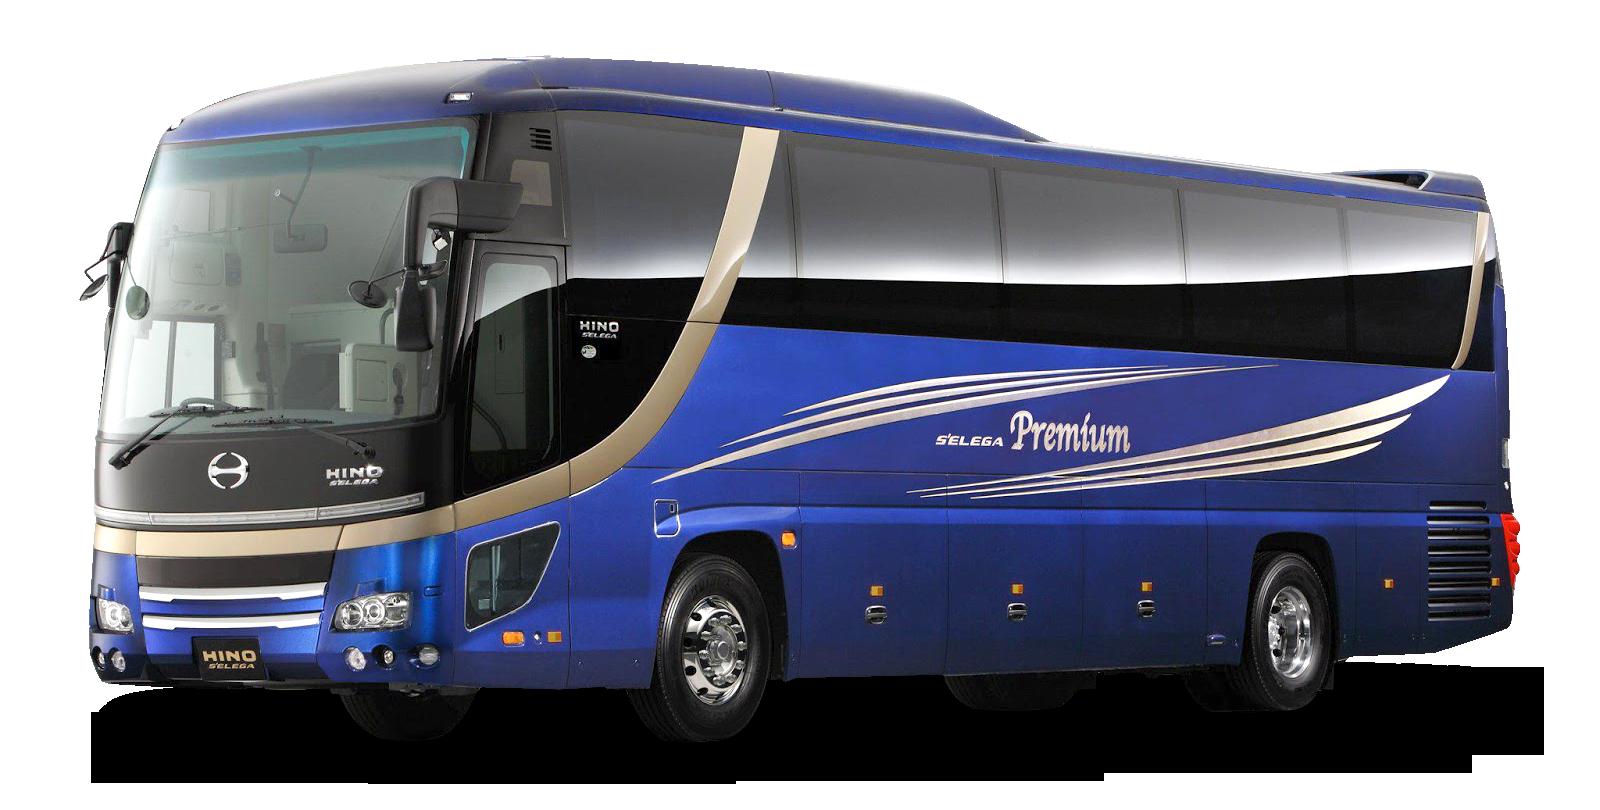 Bus Png Image Blue Bus Hino Bus